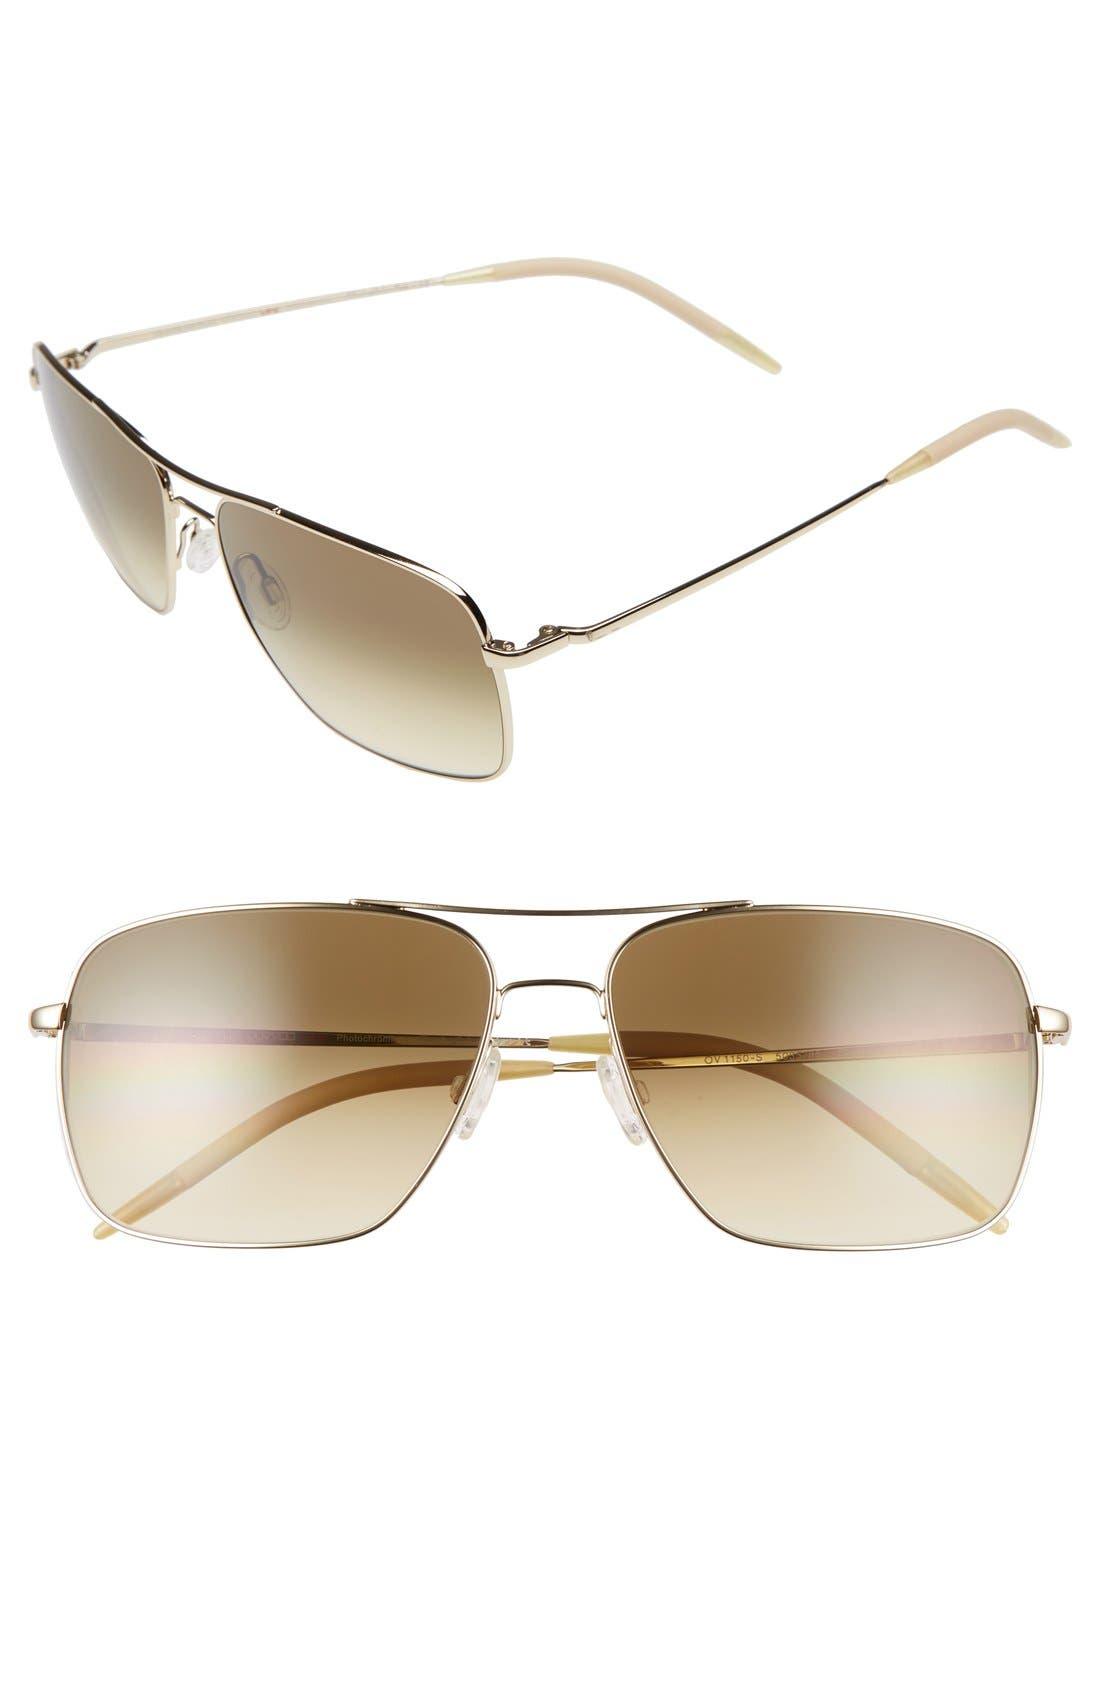 Clifton 58mm Aviator Sunglasses,                             Alternate thumbnail 2, color,                             GOLD